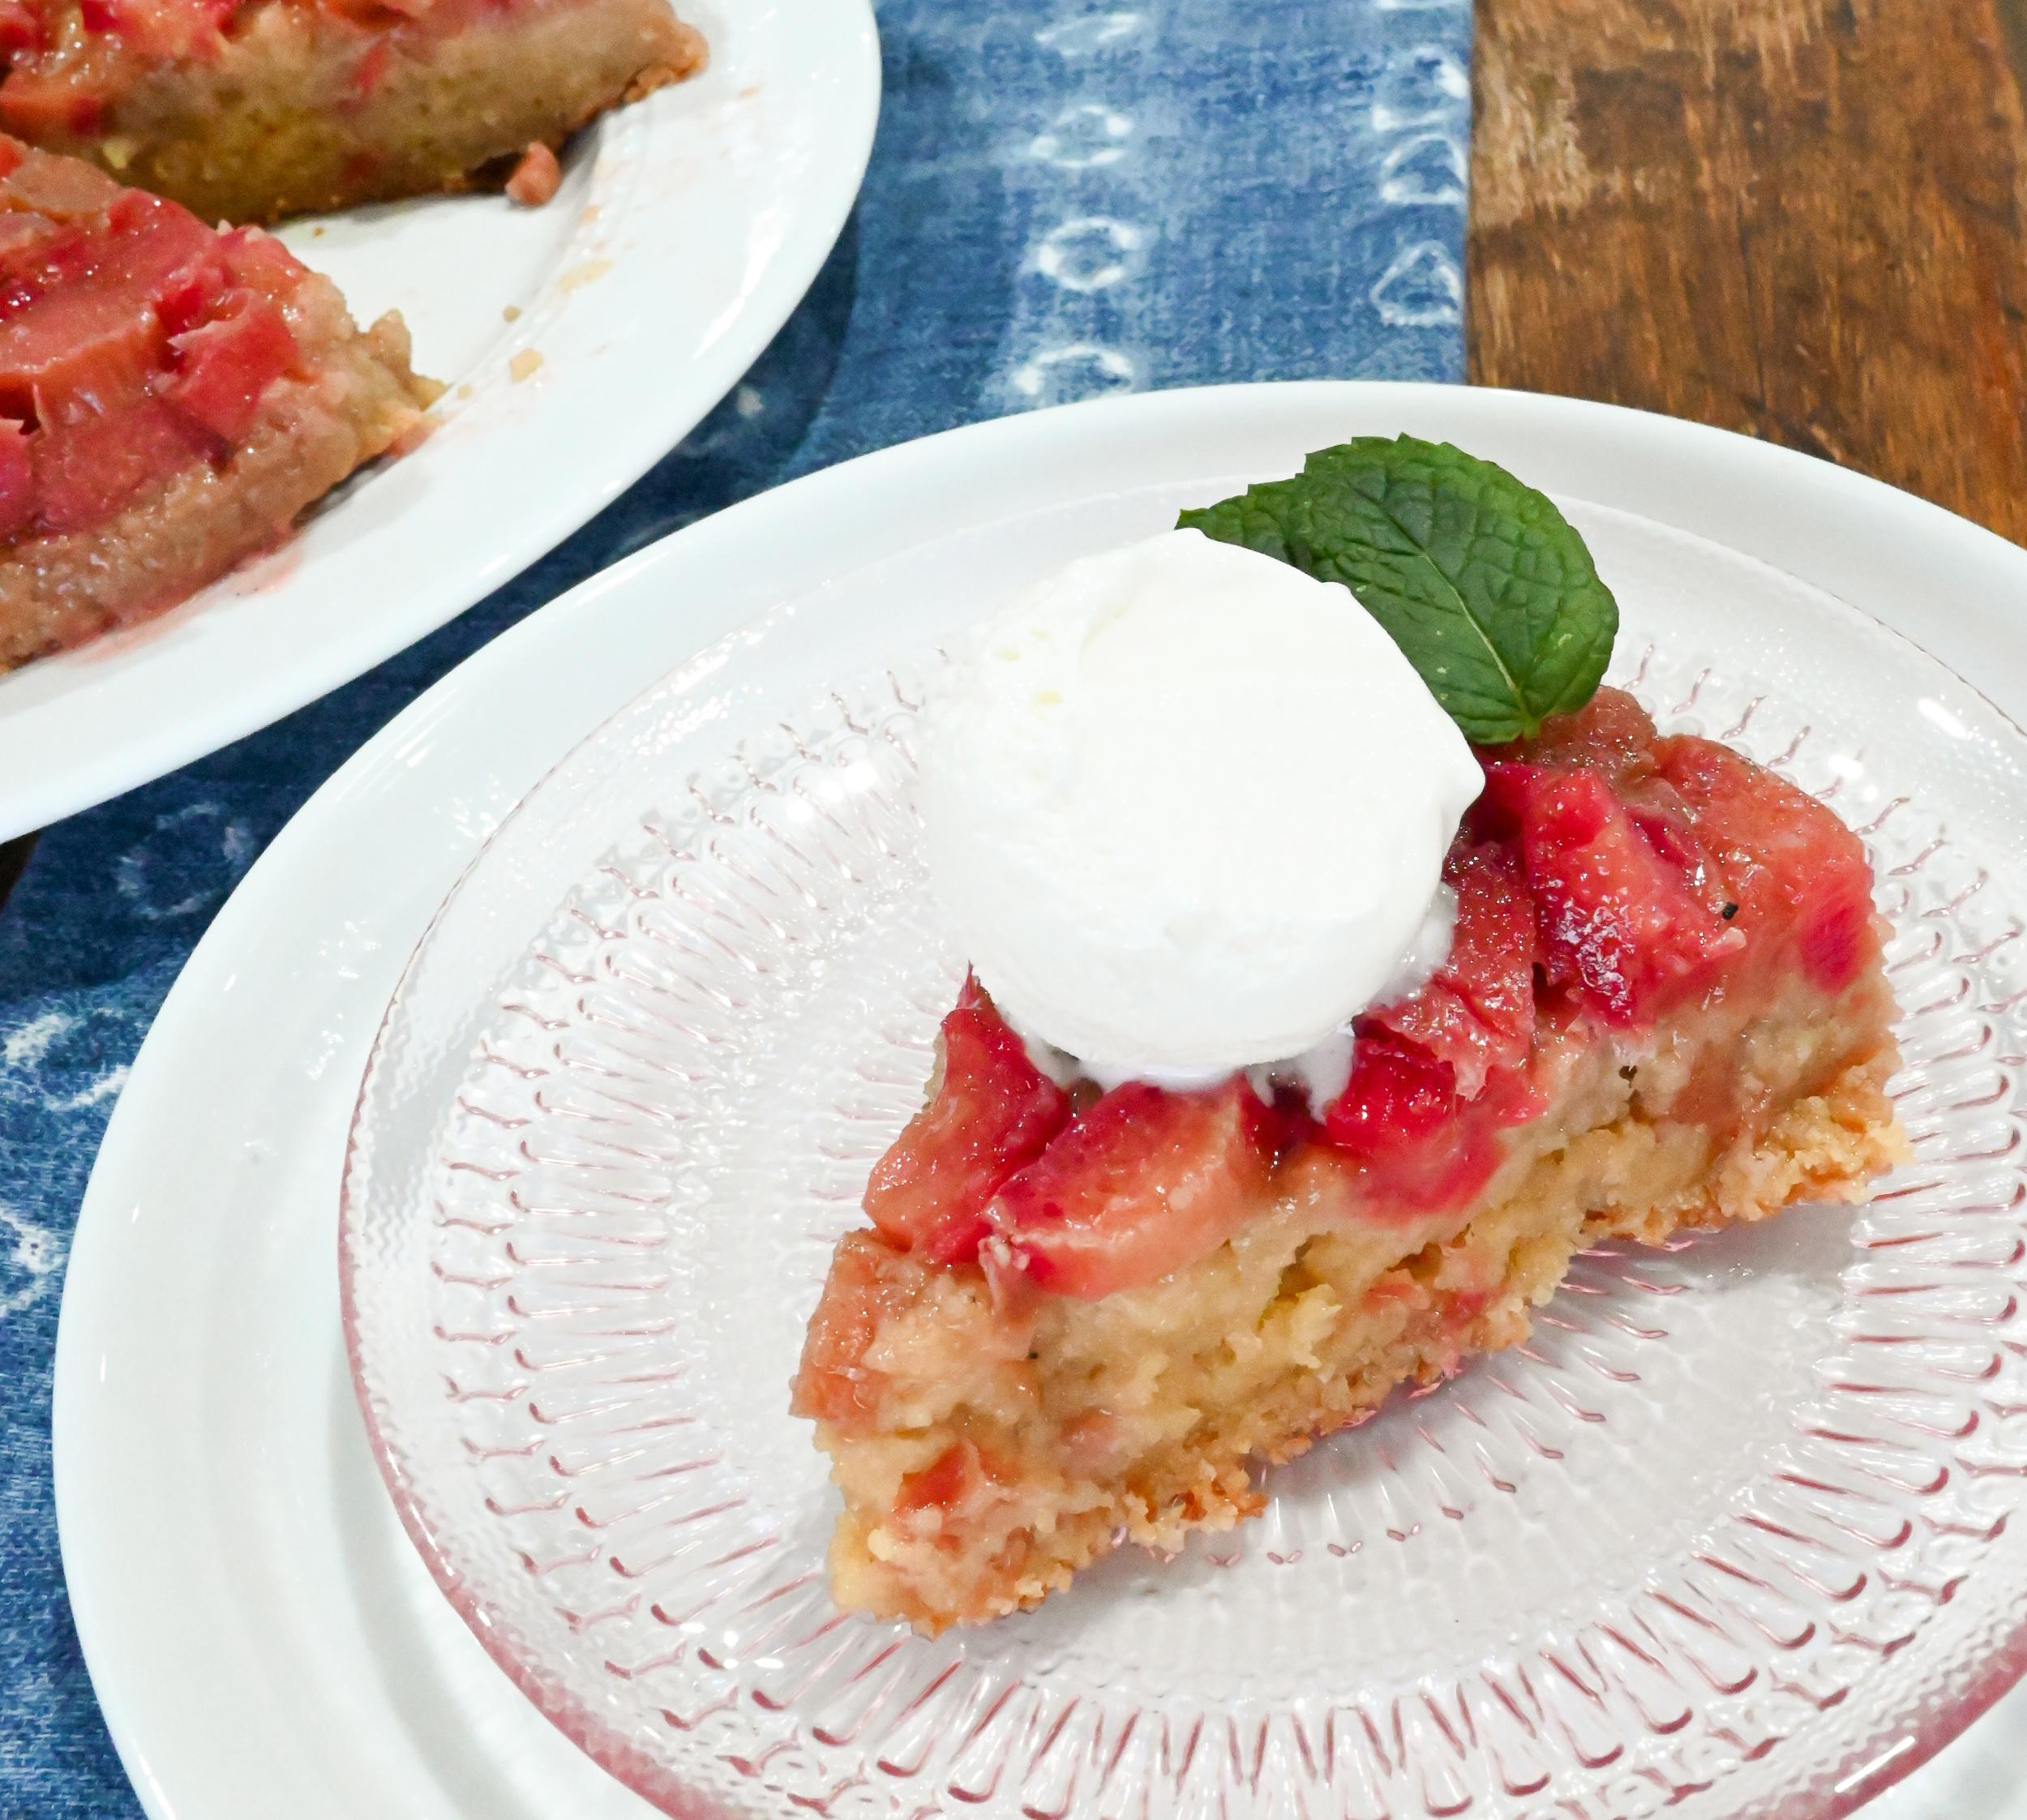 keto rhubarb upside down cake slice served with a scoop of vanilla keto friendly ice cream